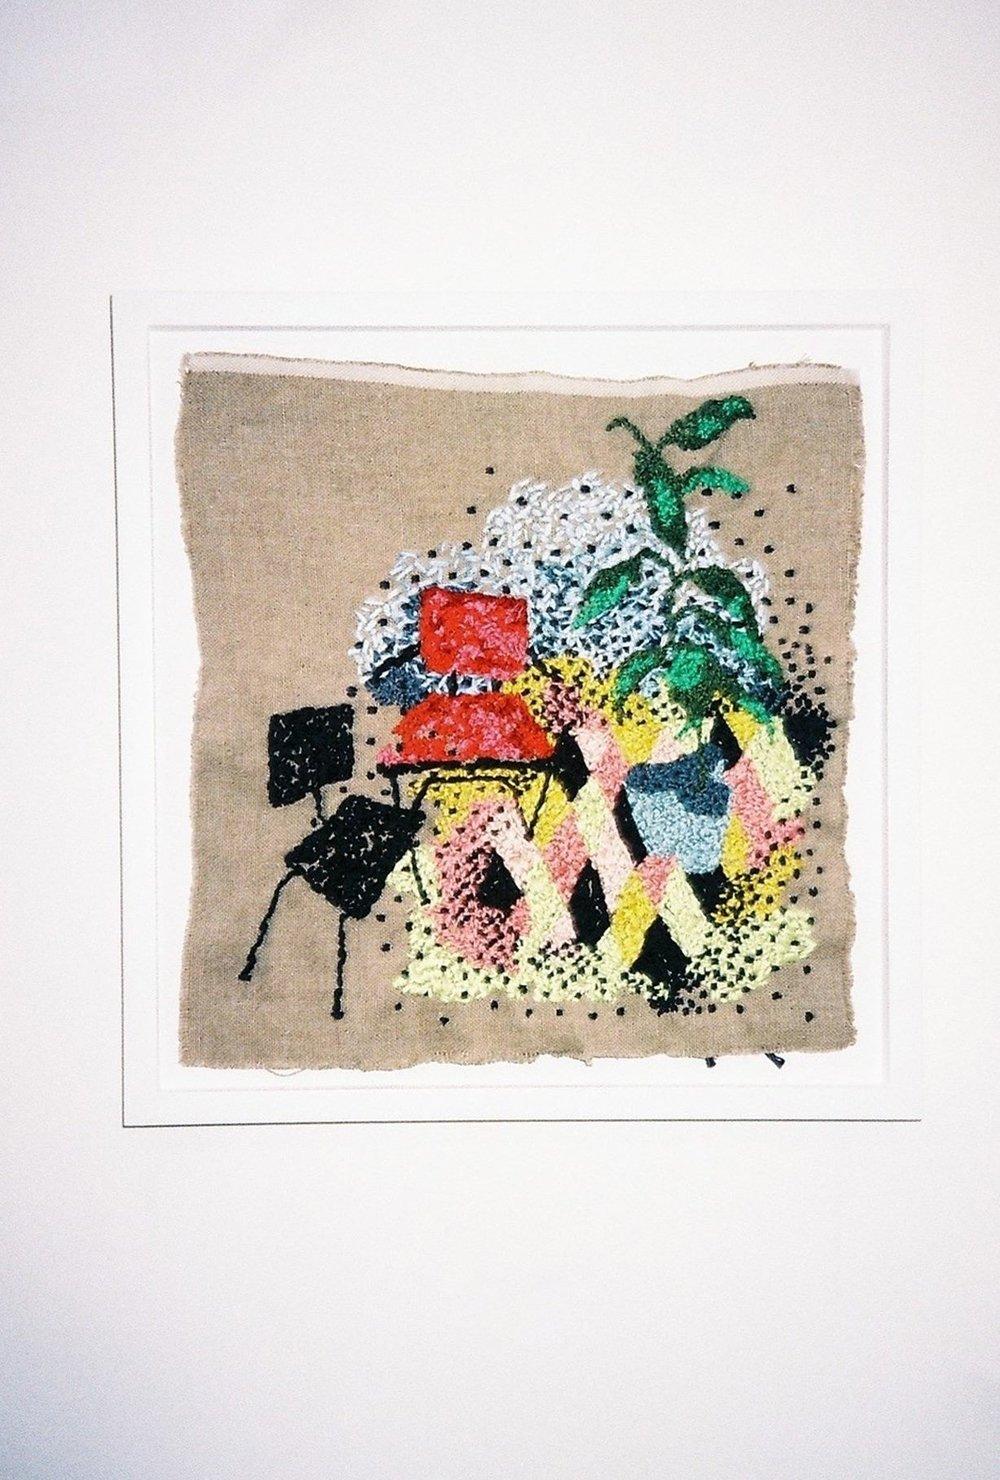 Sara Berman, Argyle floor Tapestry. Assorted threads on linen 37cm by 37cm framed | Photography by Delilah Olson -